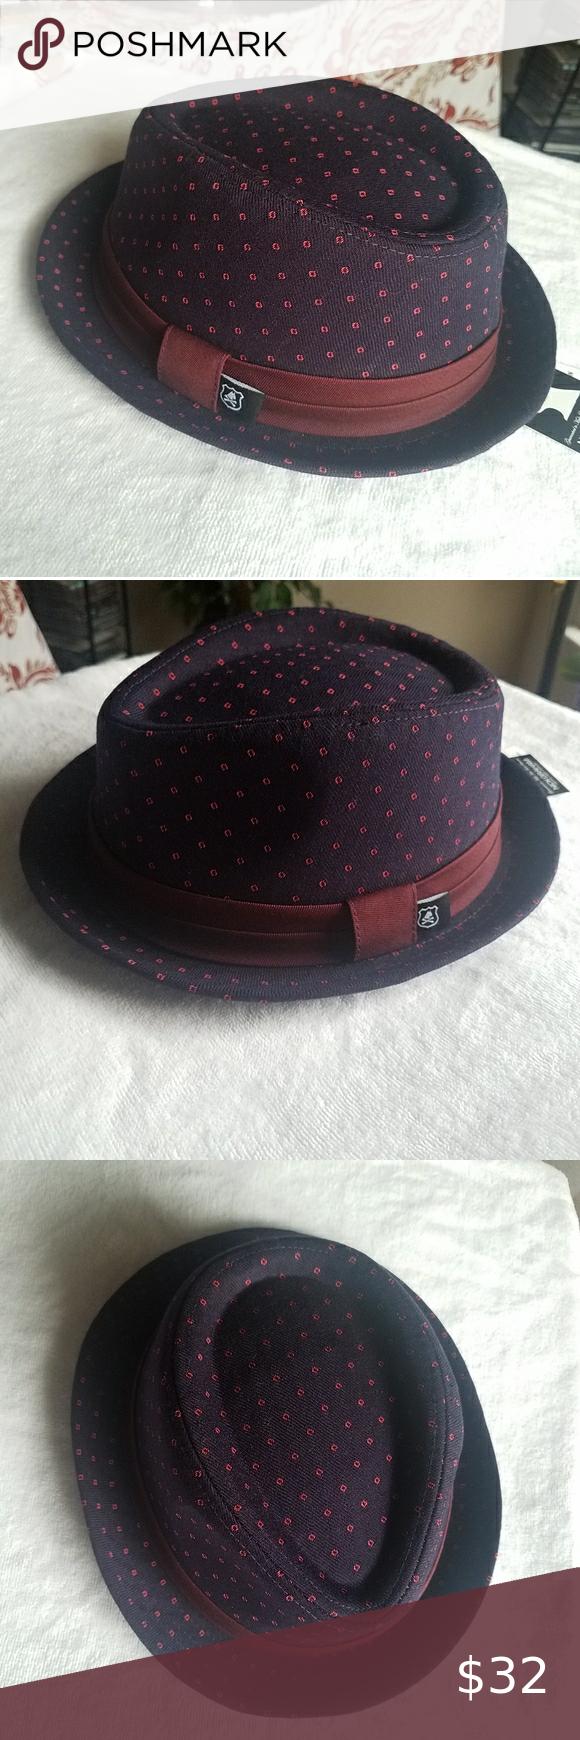 Nick Graham Hat Hats Accessories Hats Red Purple